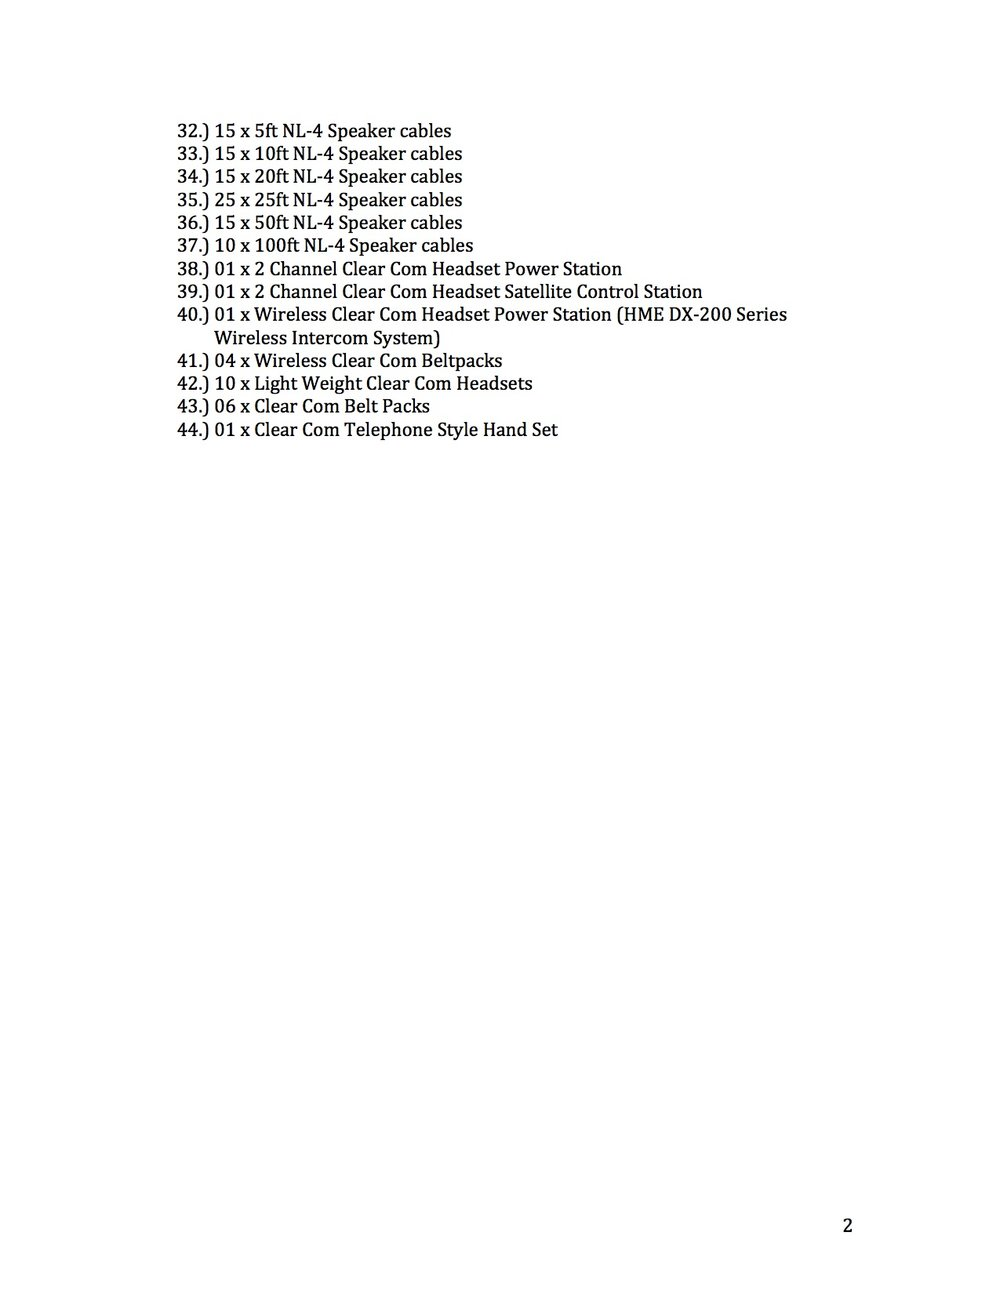 07 Royale Equipment List 8-6-16.jpg